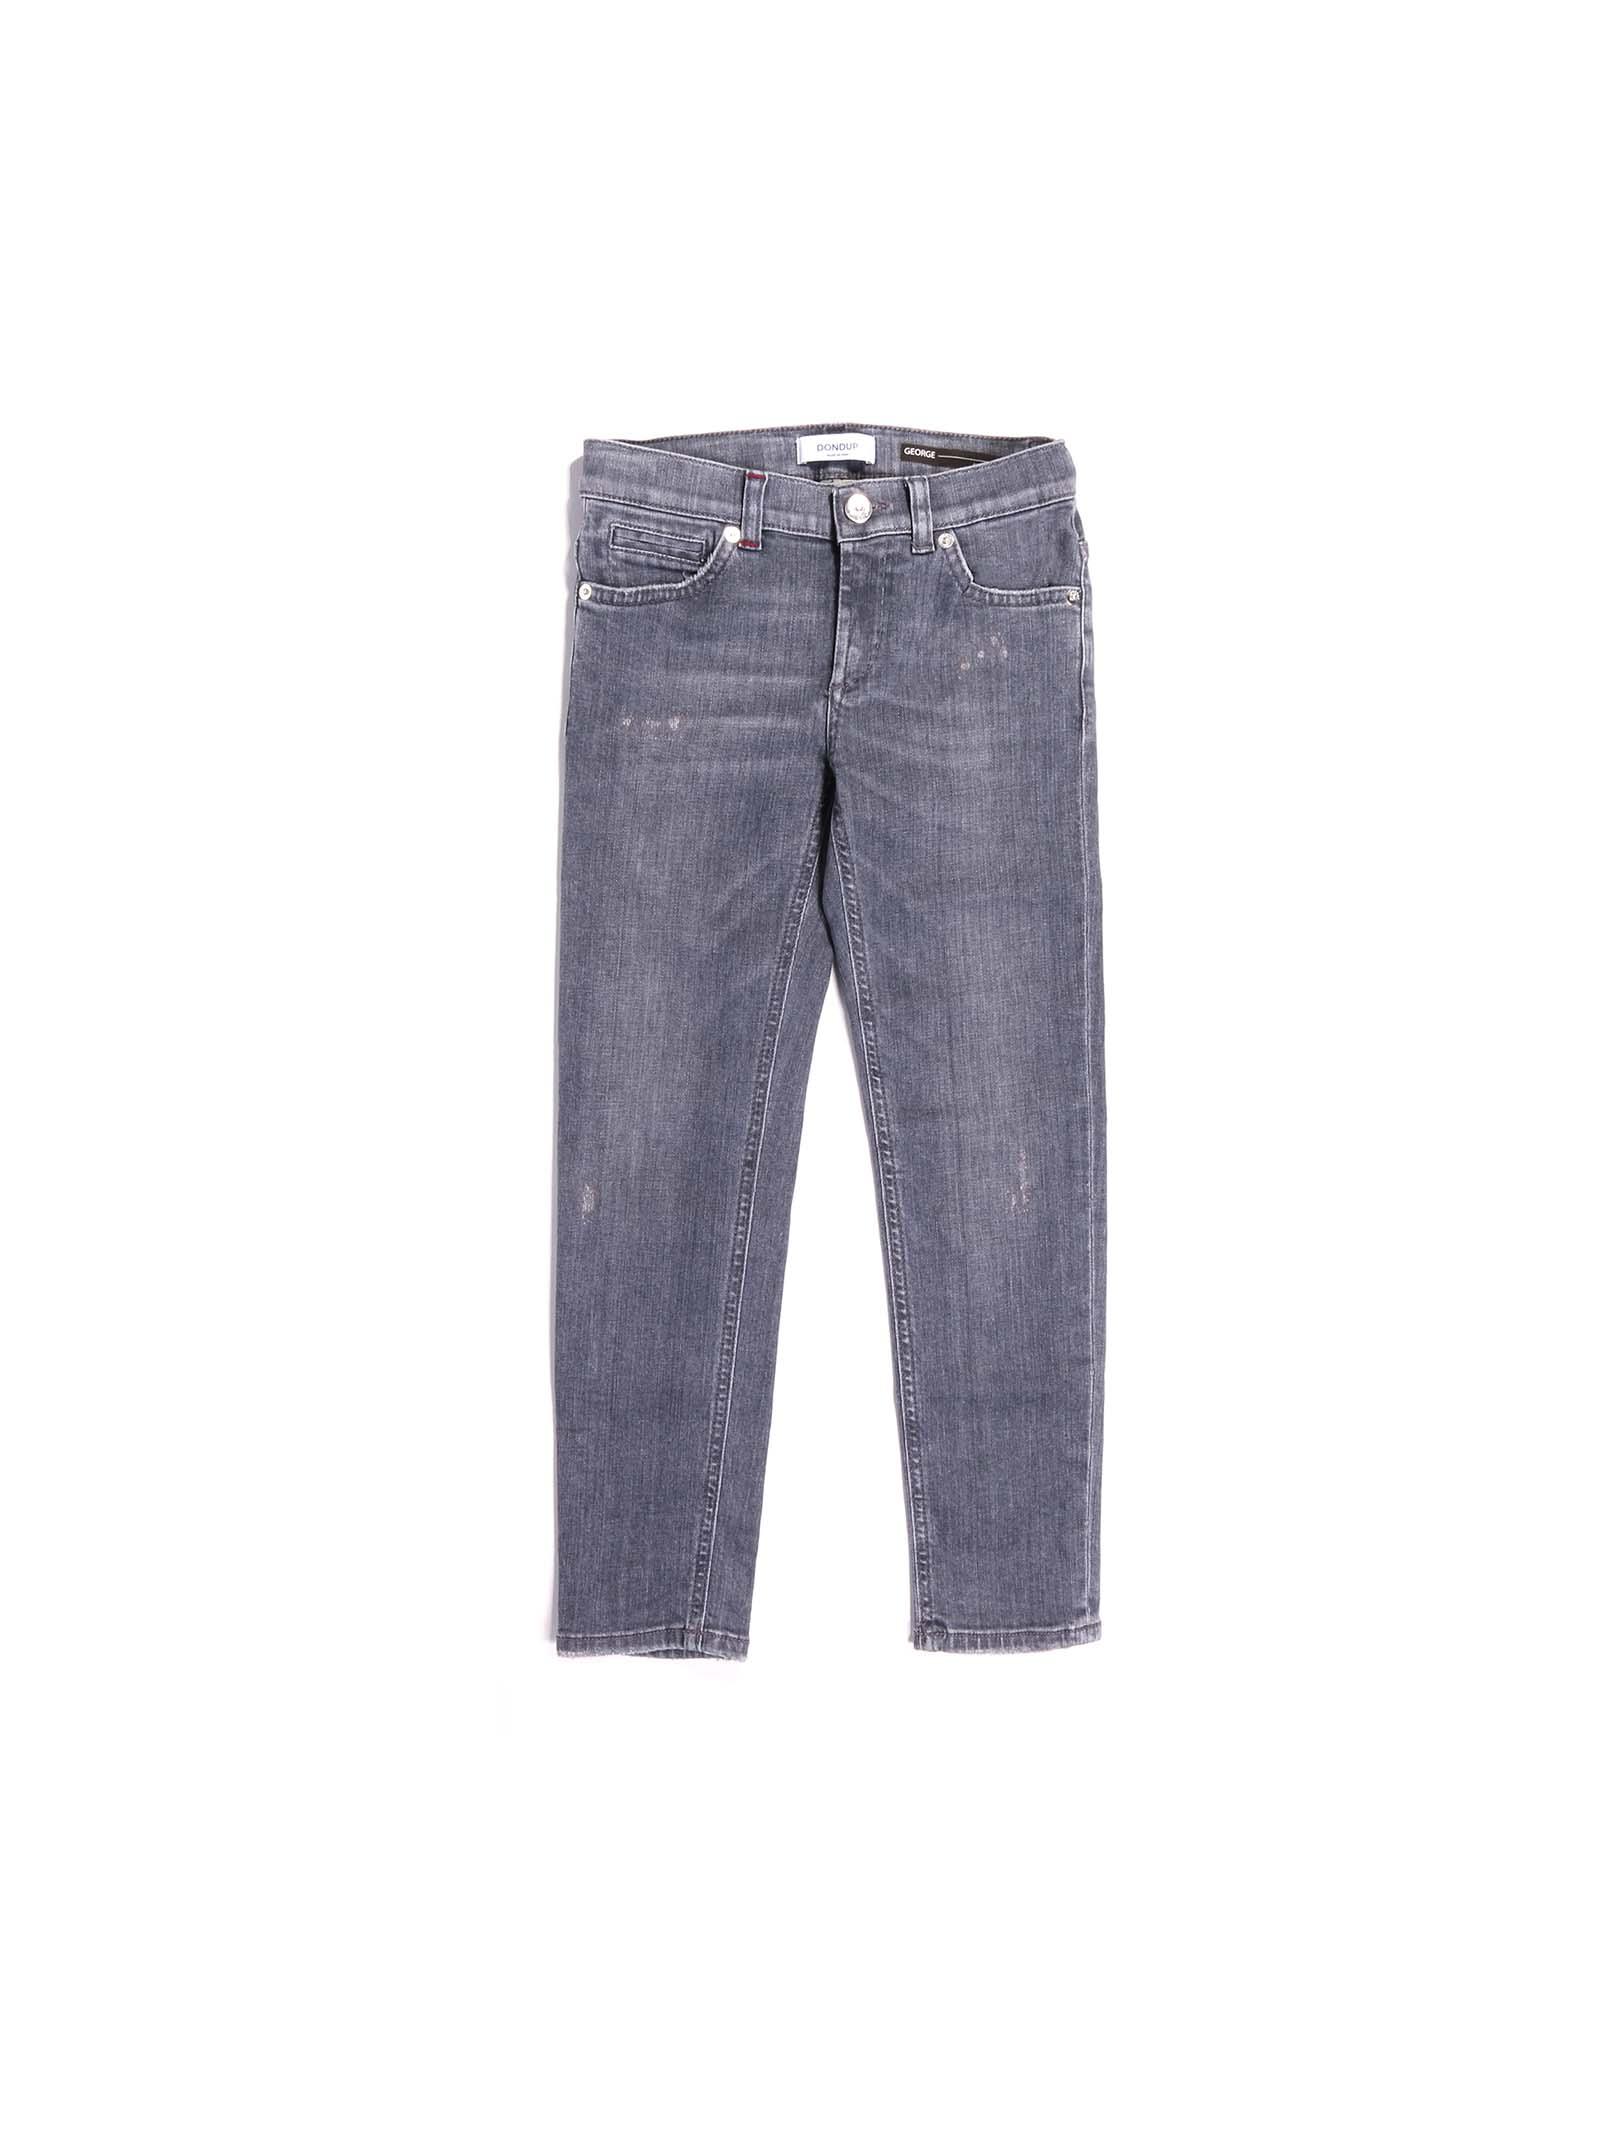 jeans denim grigio Dondup | Pantalone | BP227 RS0039 PTD BD W20998